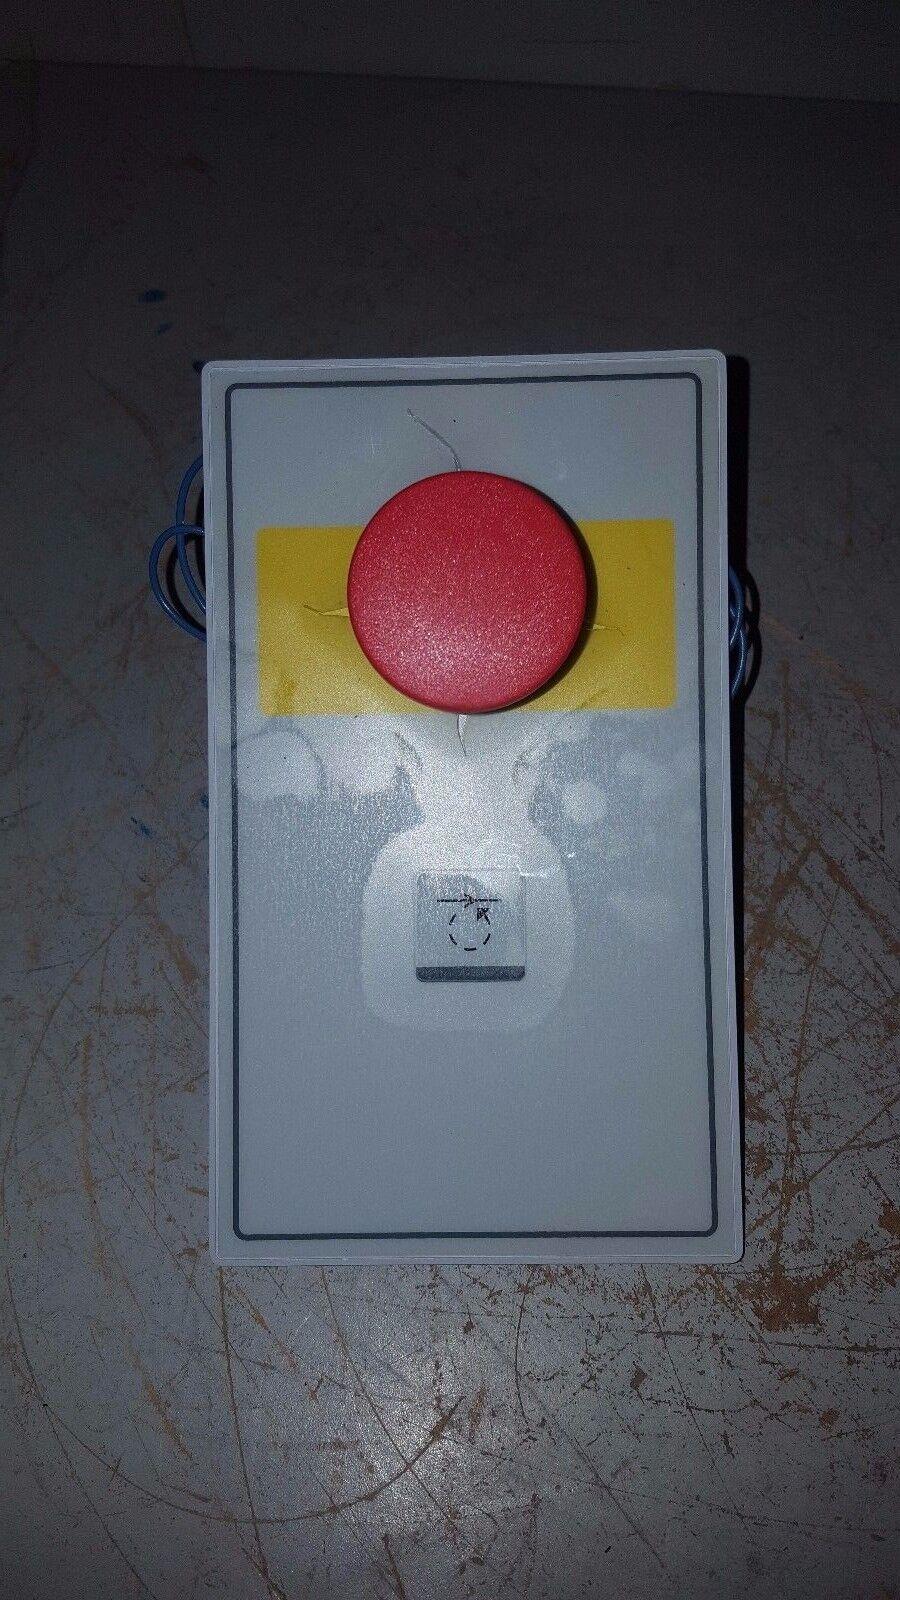 Eastprint E Stop Switch Panel, 5551820-02 REV - 01263 PDB73975